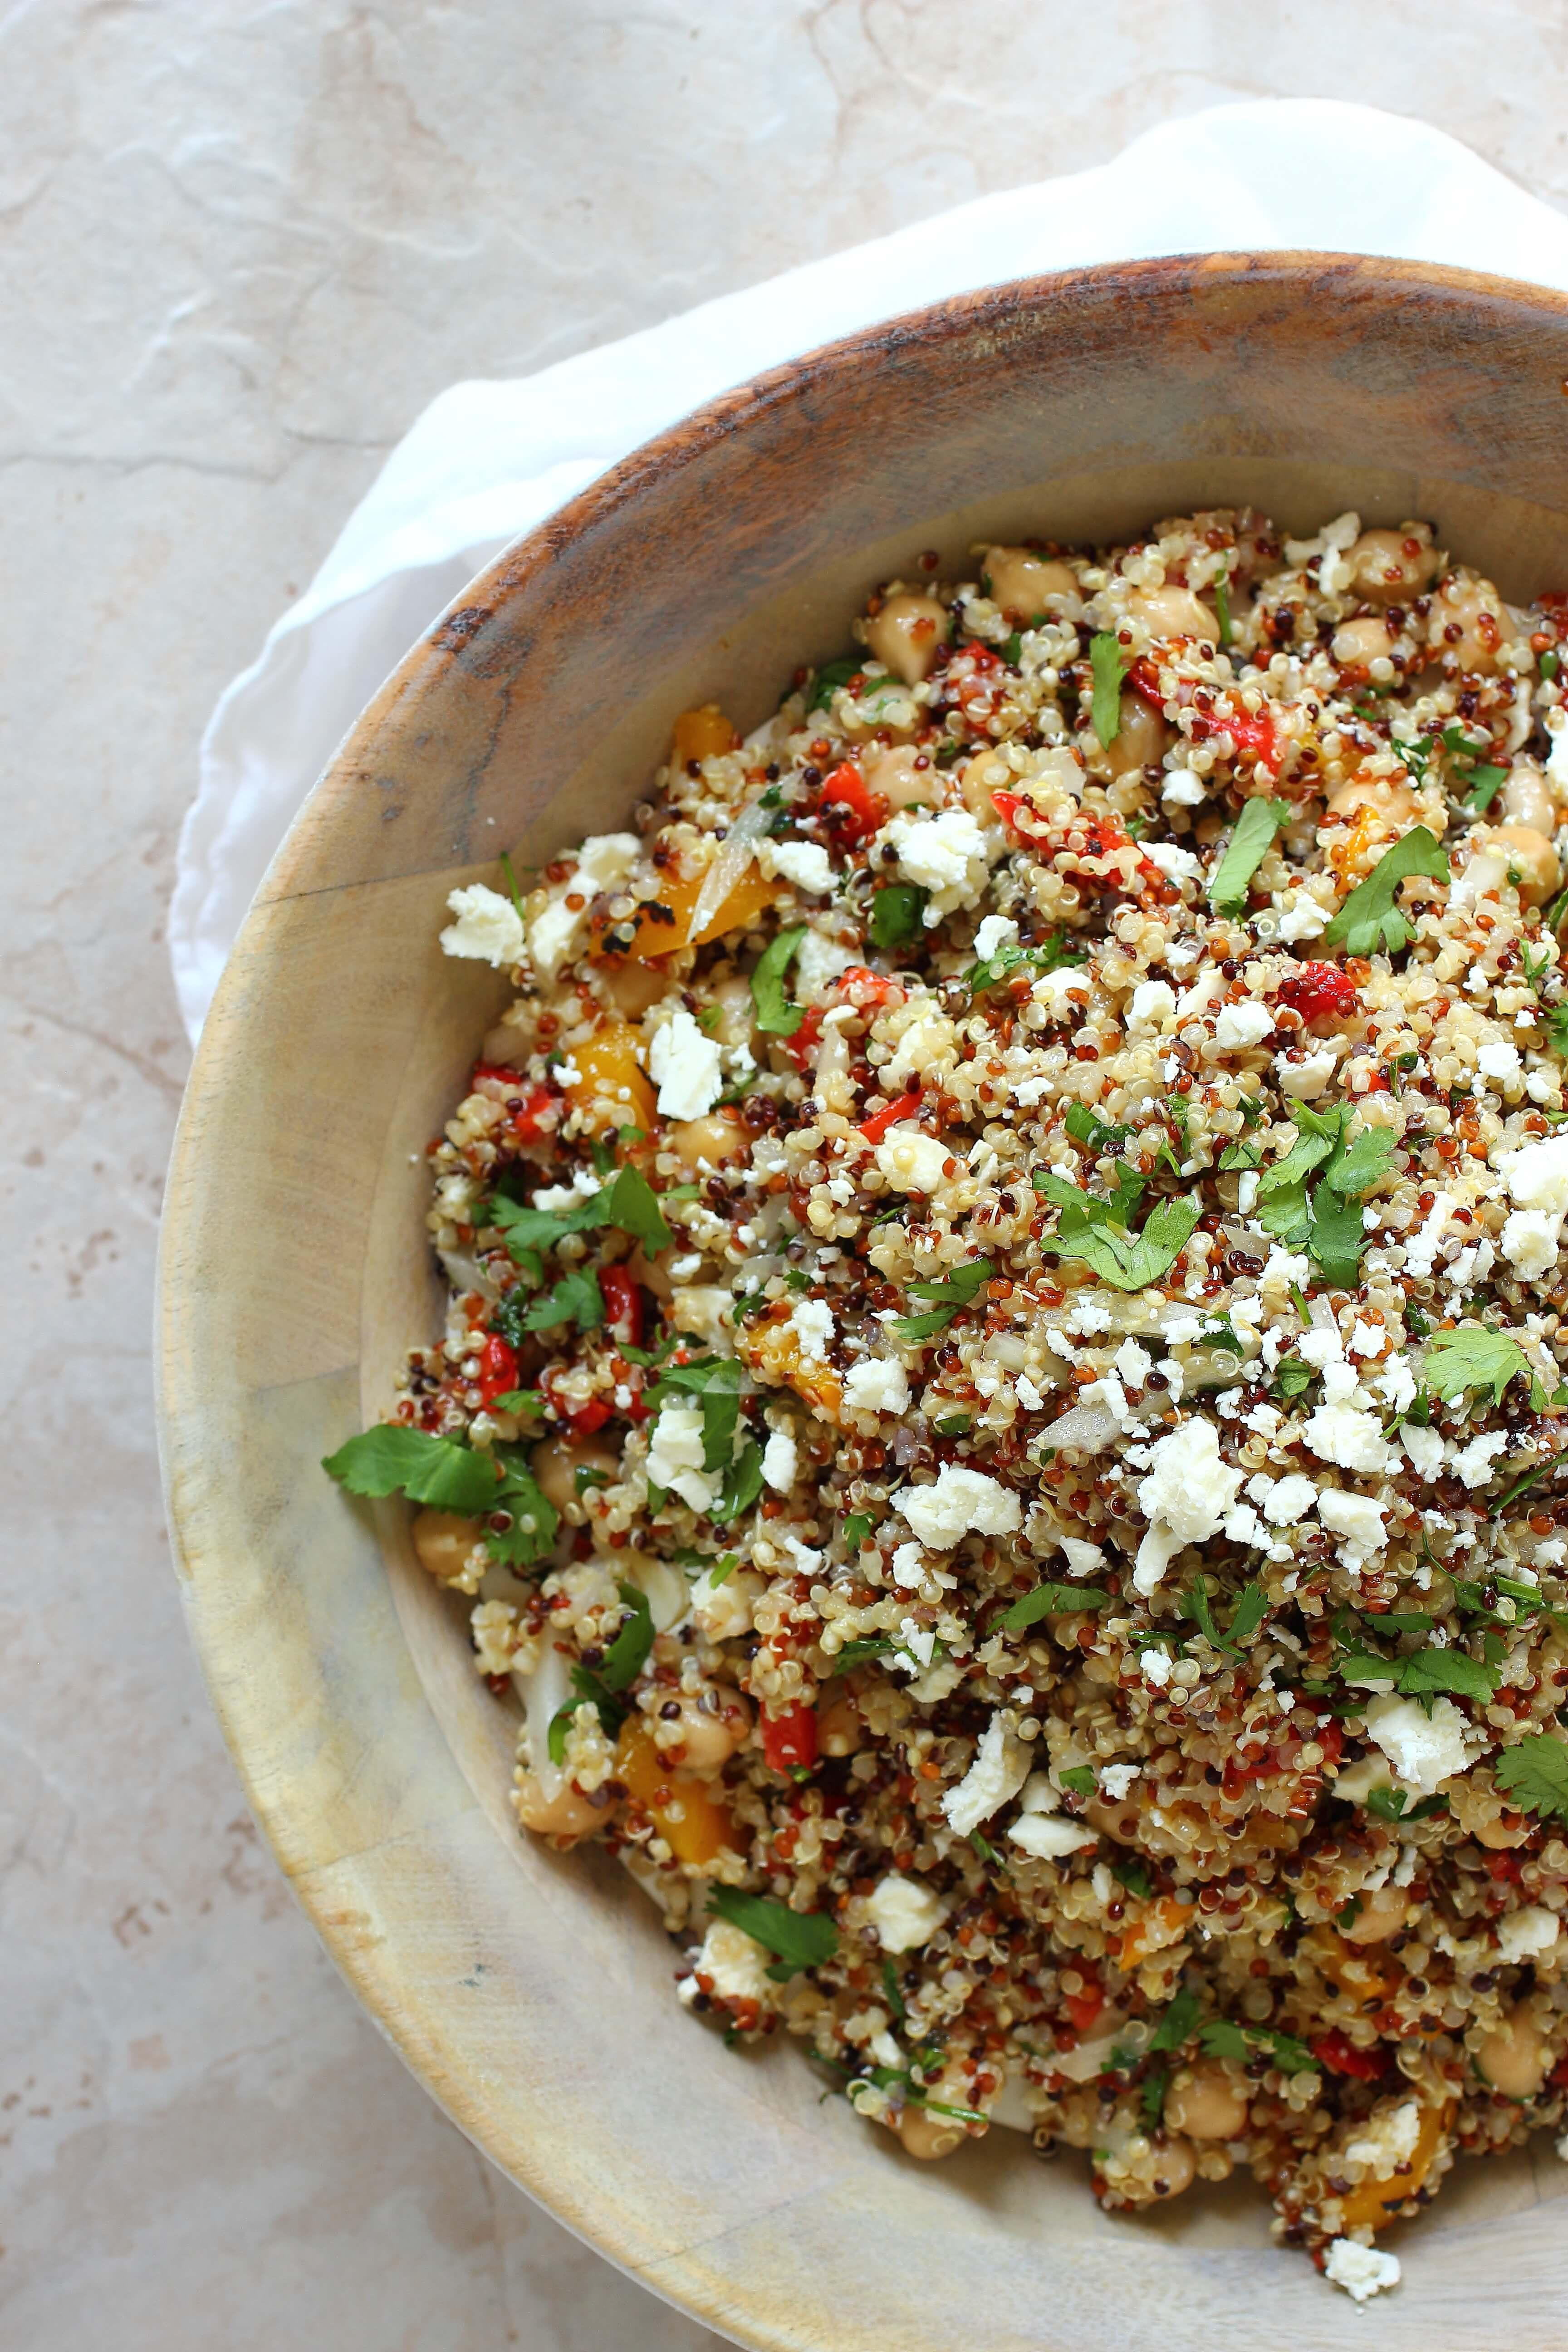 Quinoa Healthy Or Not  Healthy Quinoa Salad with Feta Cheese